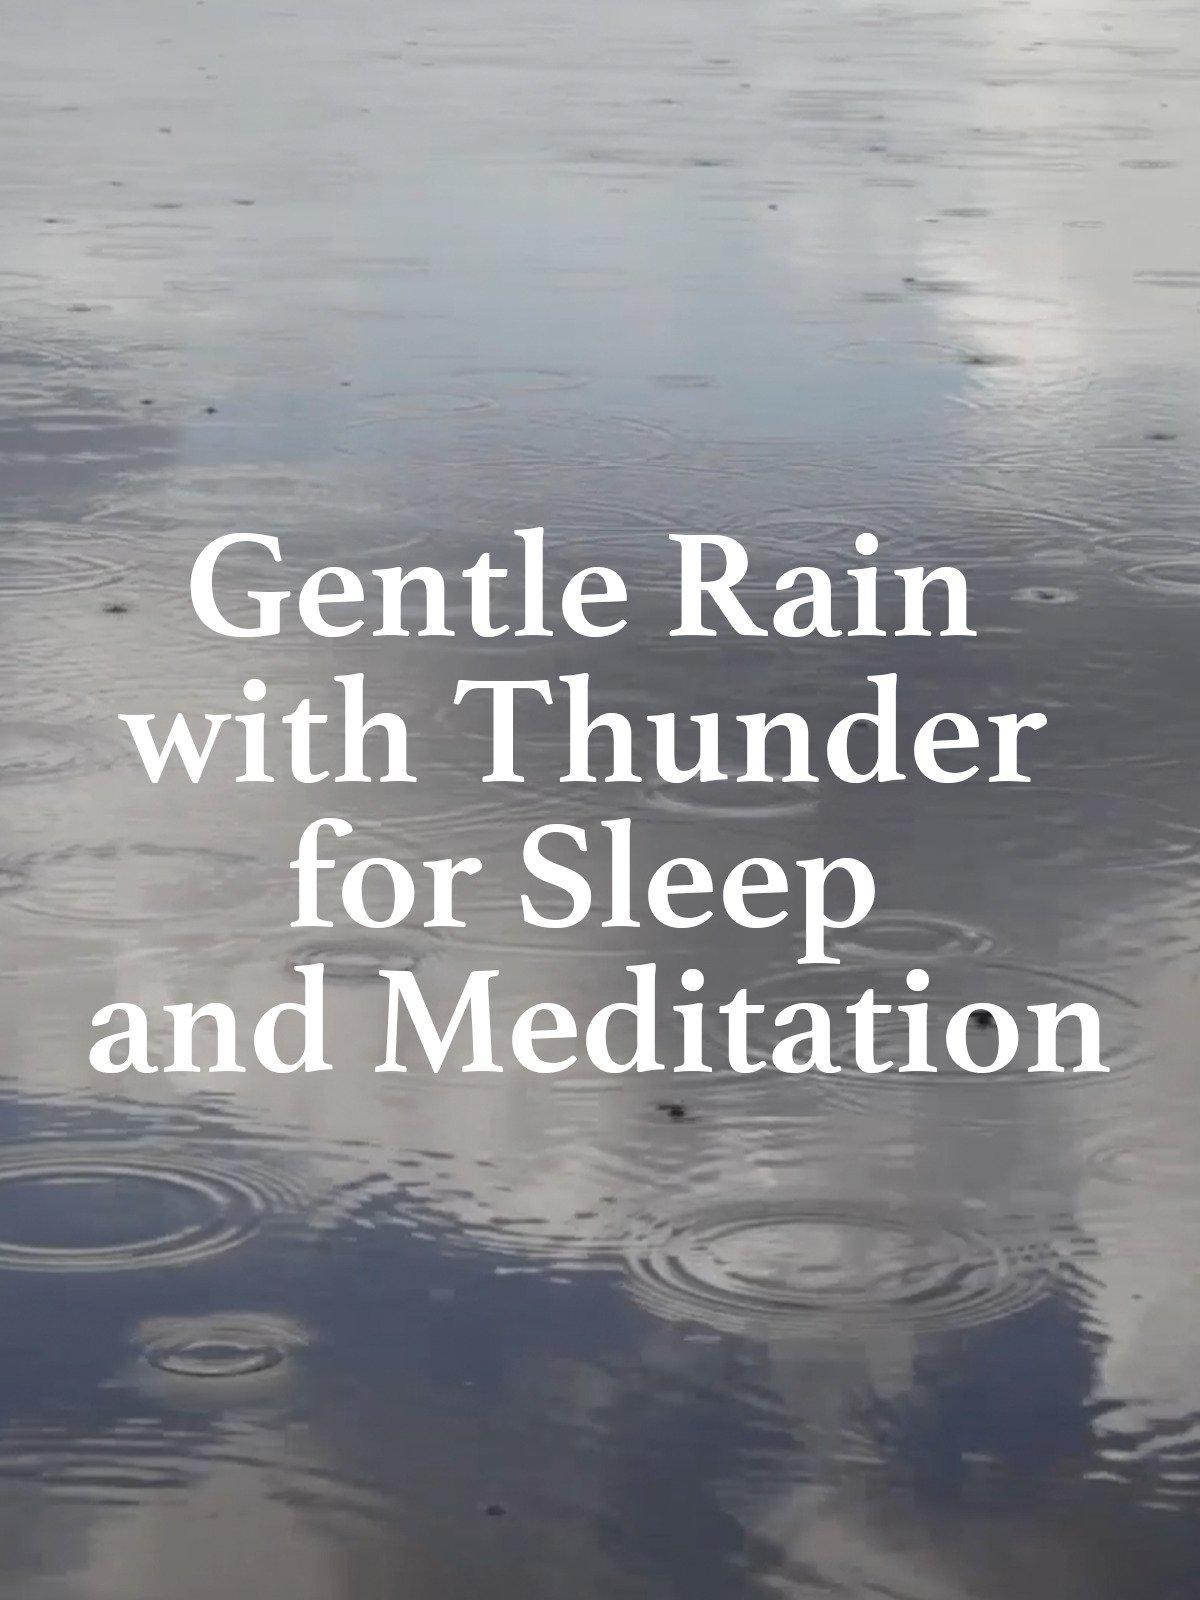 Gentle Rain with Thunder for Sleep and Meditation